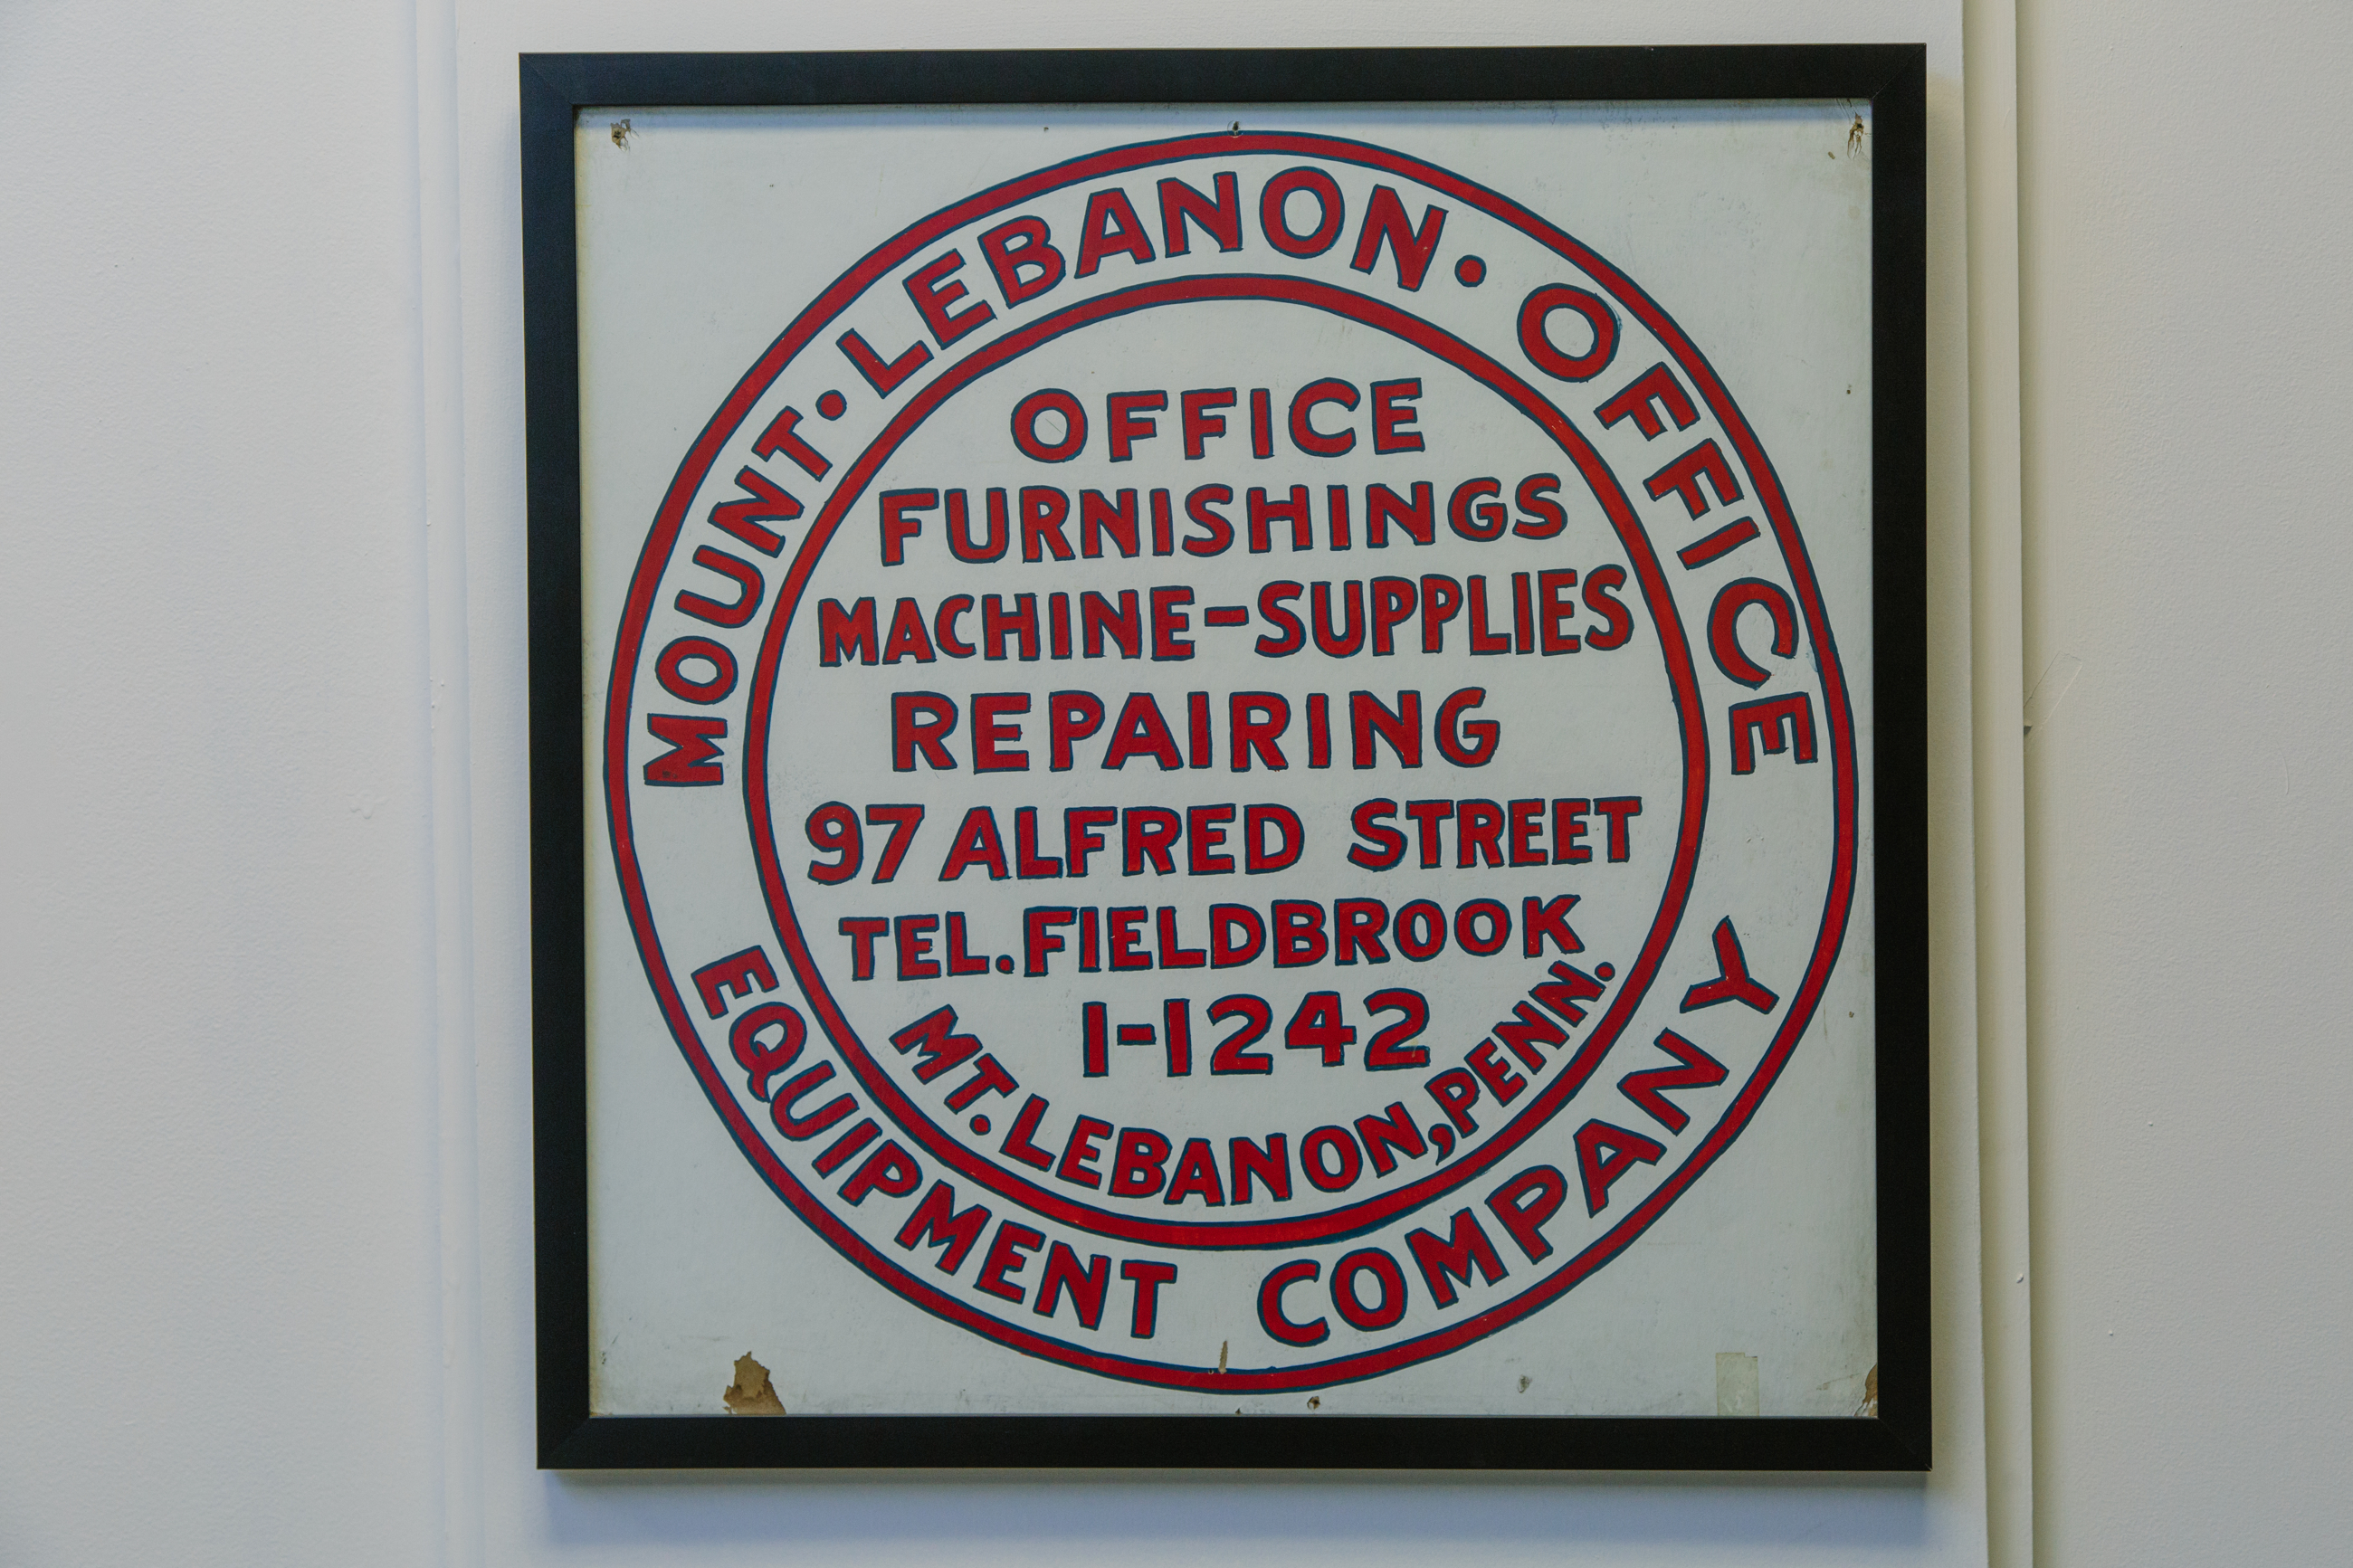 34 Office Furniture Company Lebanon Mt Lebanon